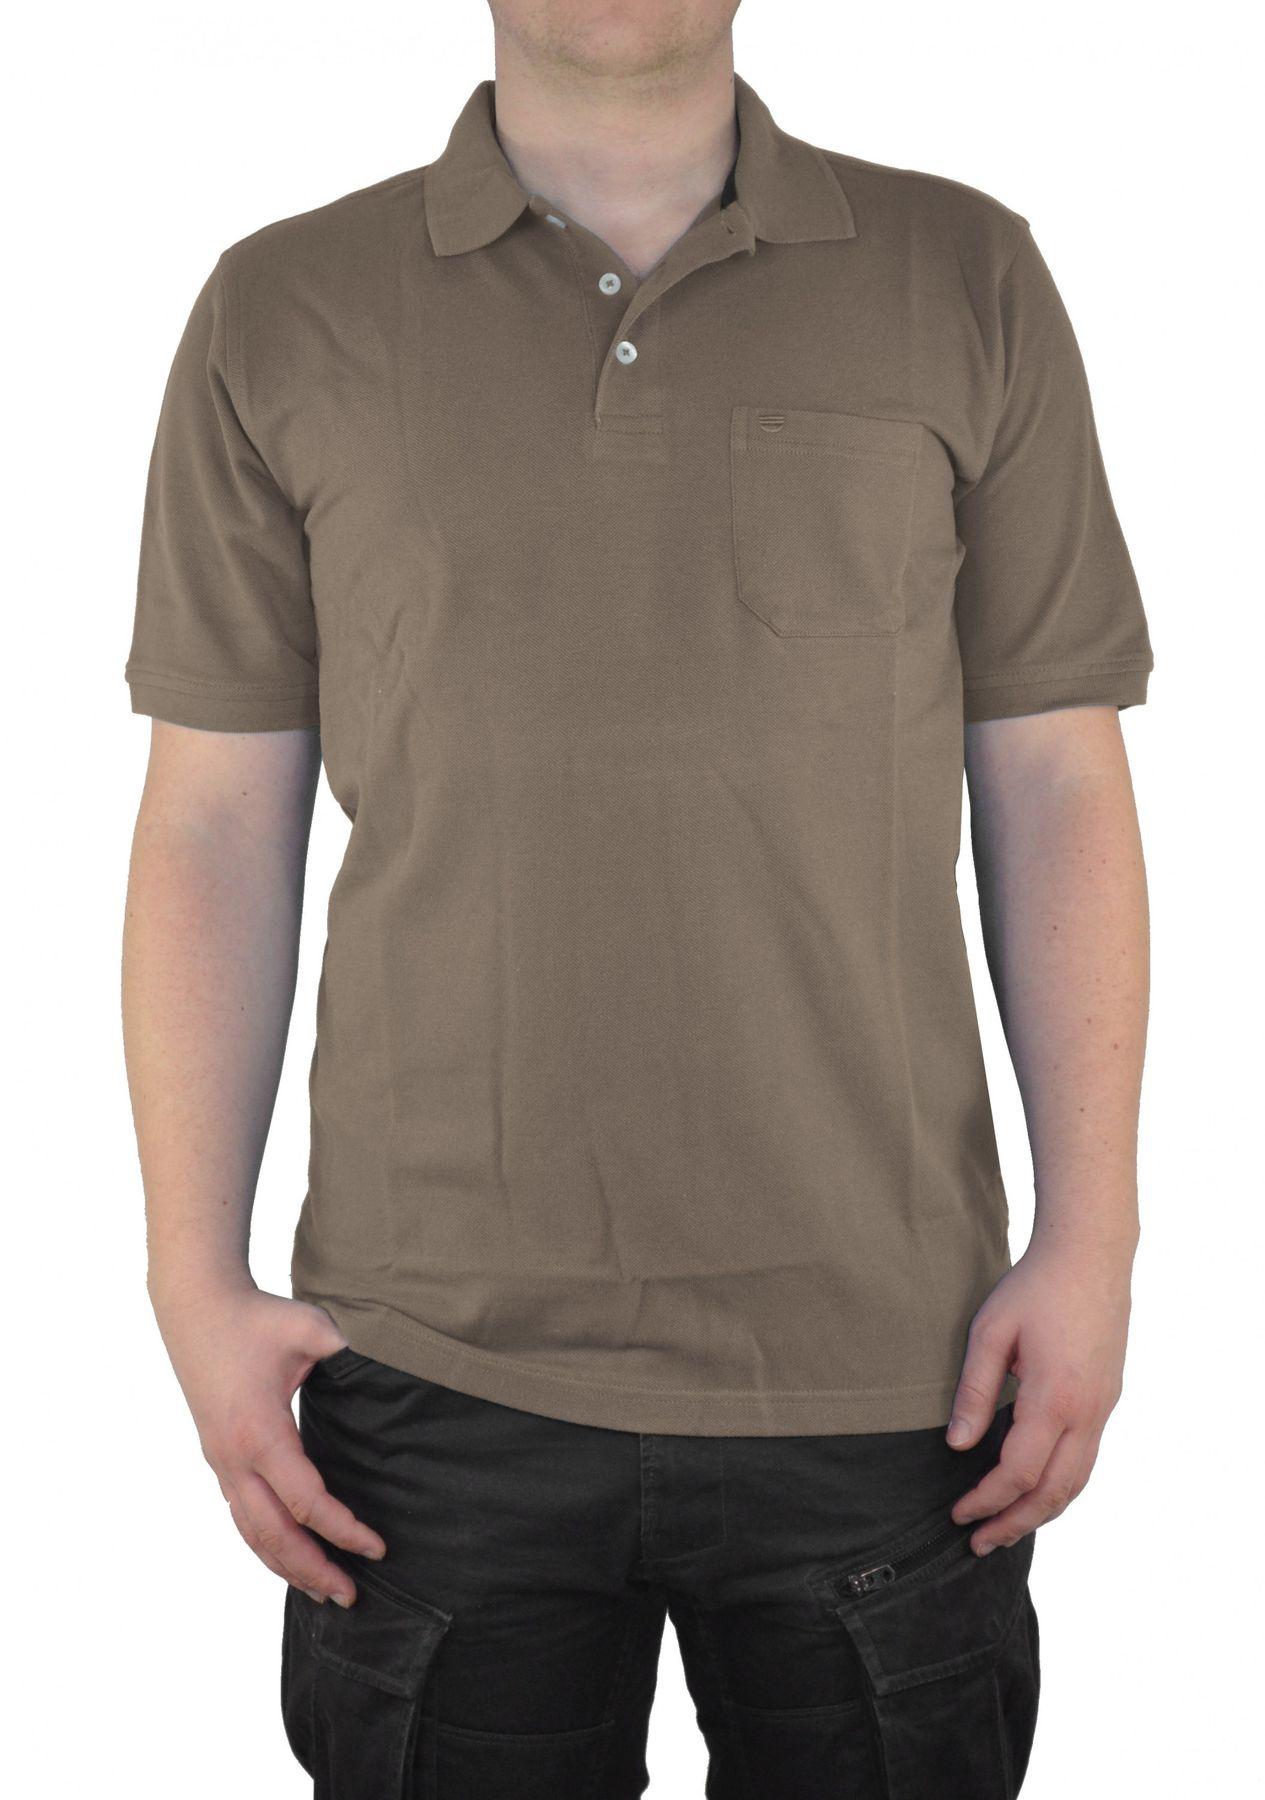 Redmond - Regular Fit - Herren Polo Shirt in verschiedenen Farben (900 A) – Bild 14